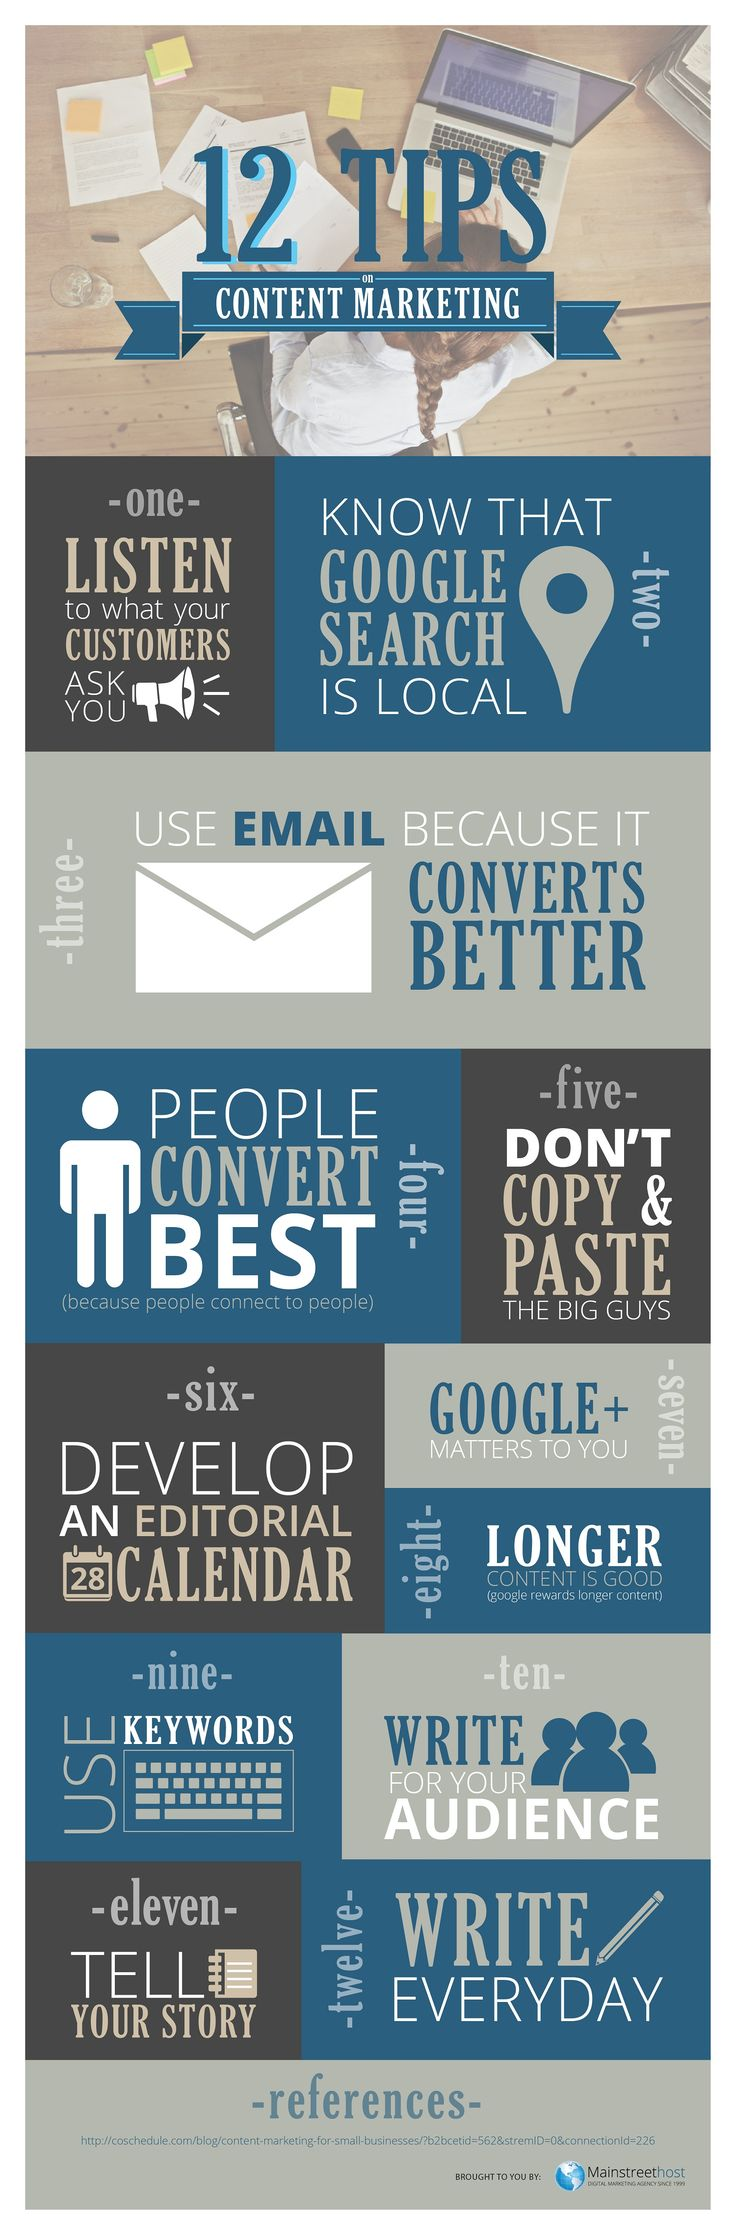 12 Content Marketing Tips #infographic #ContentMarketing #Marketing